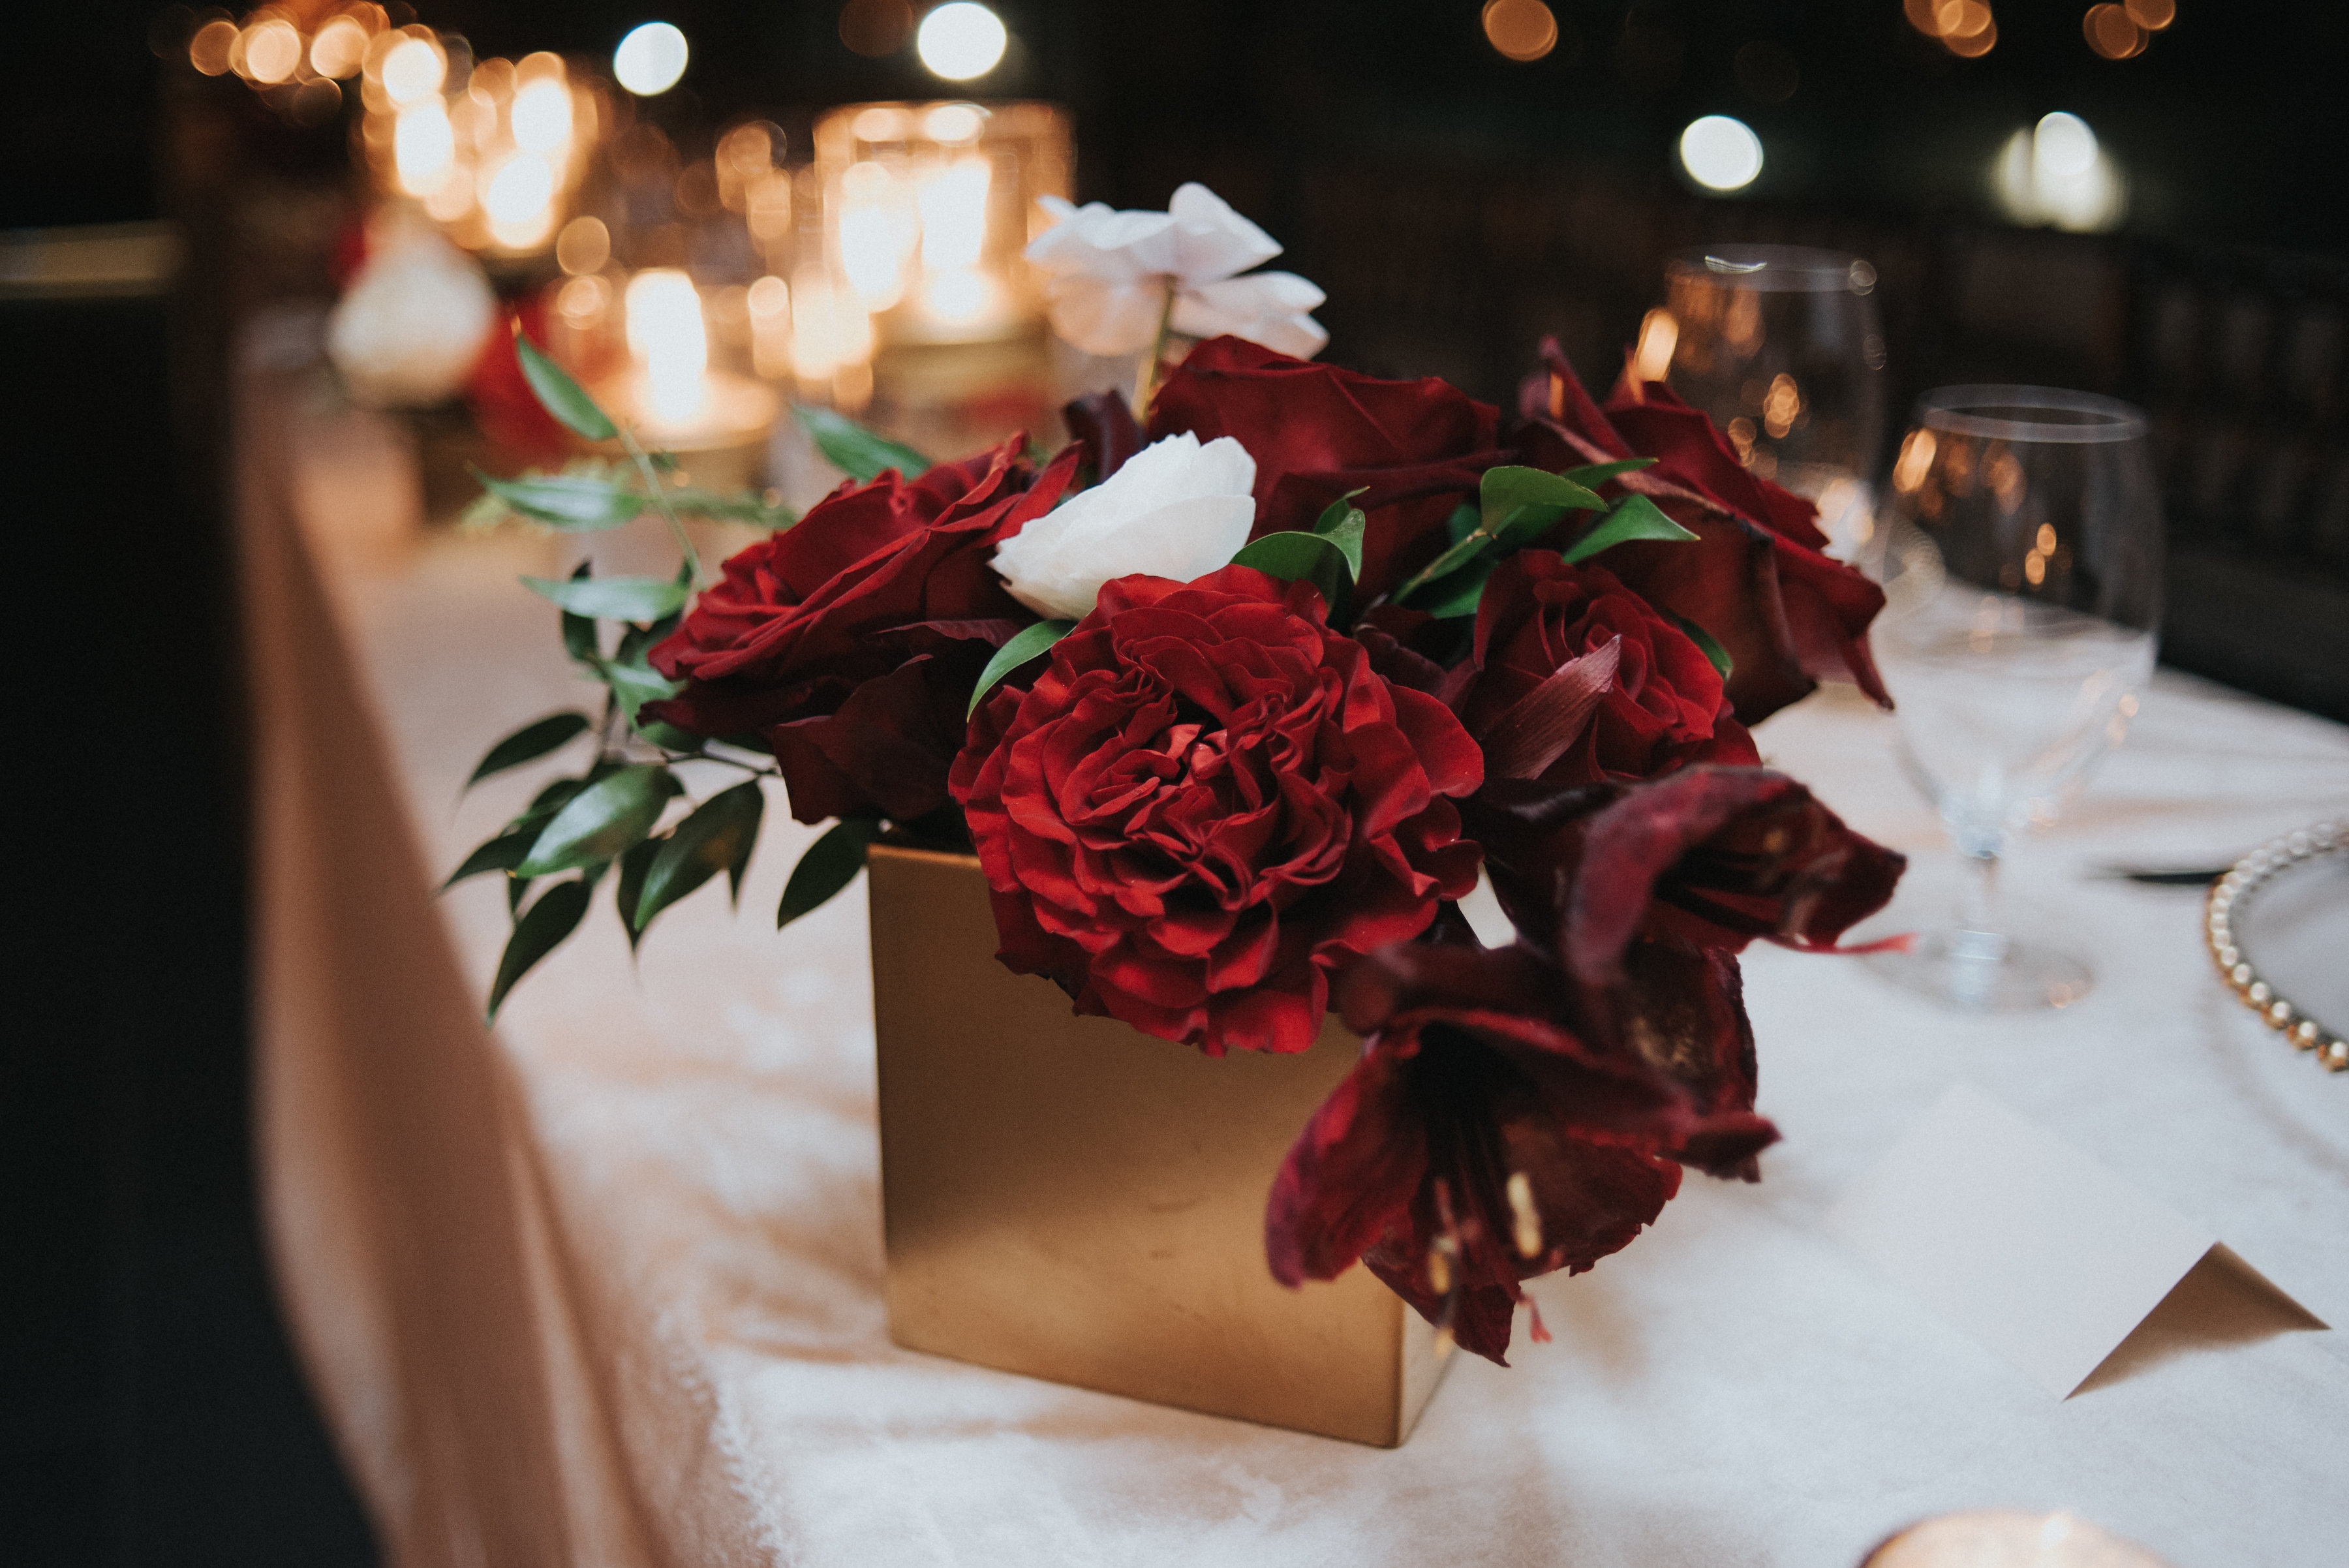 Rustic Wedding - A Fare Extraordinaire